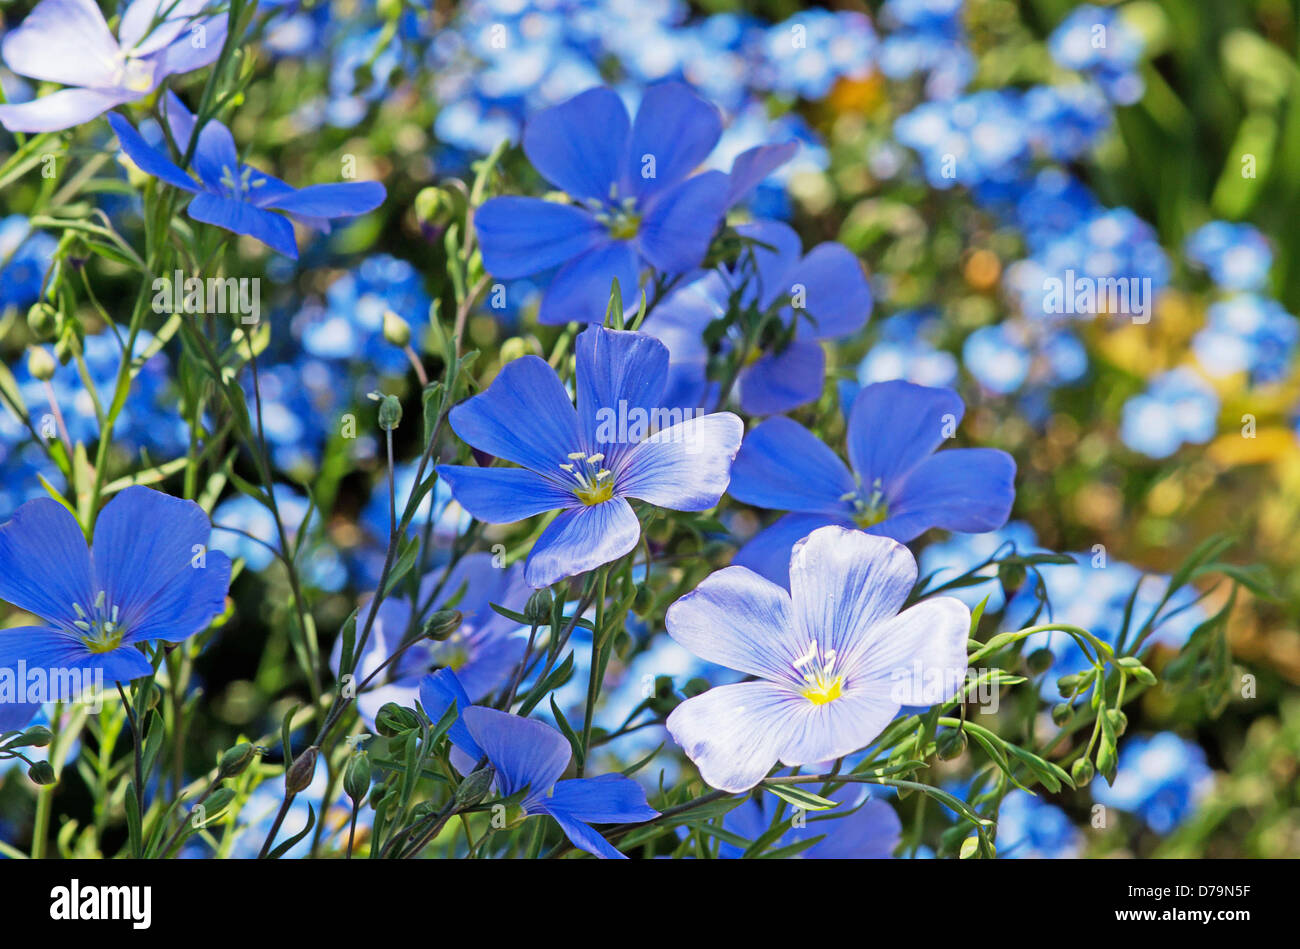 Small blue perennial flowers choice image flower decoration ideas blue flowered perennials mikes garden top 5 plants mightylinksfo